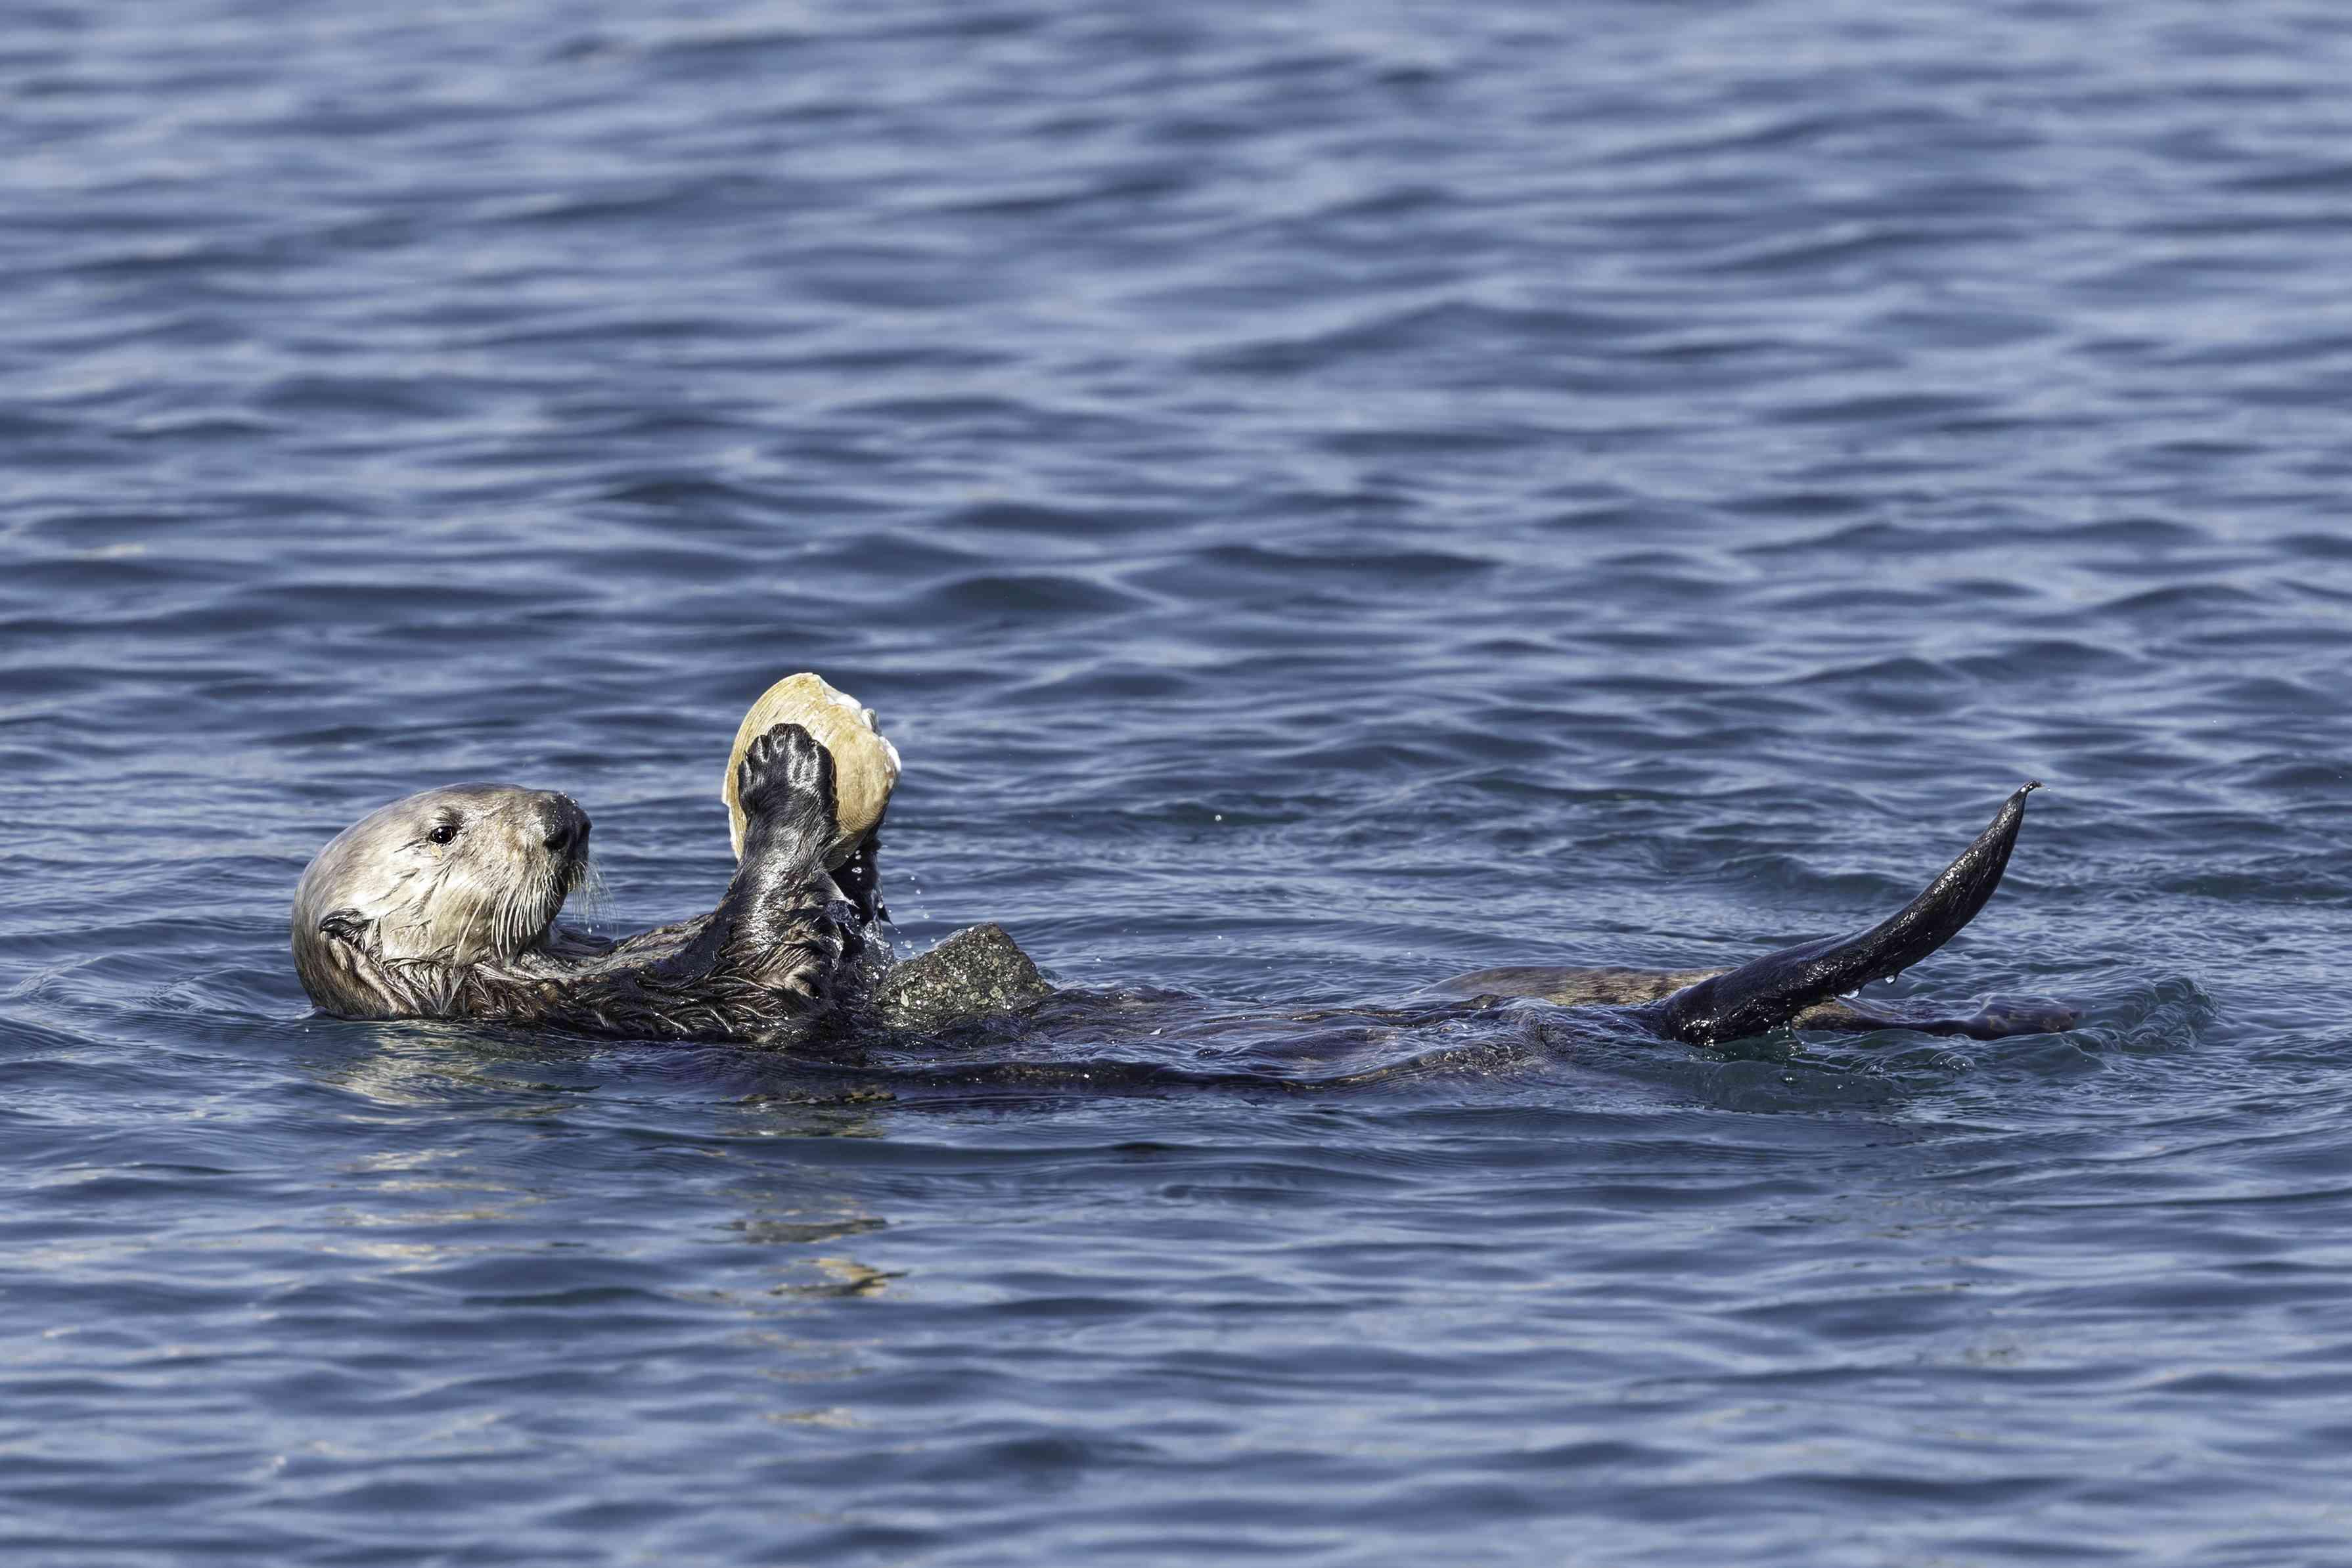 Sea Otter breaking open a clam